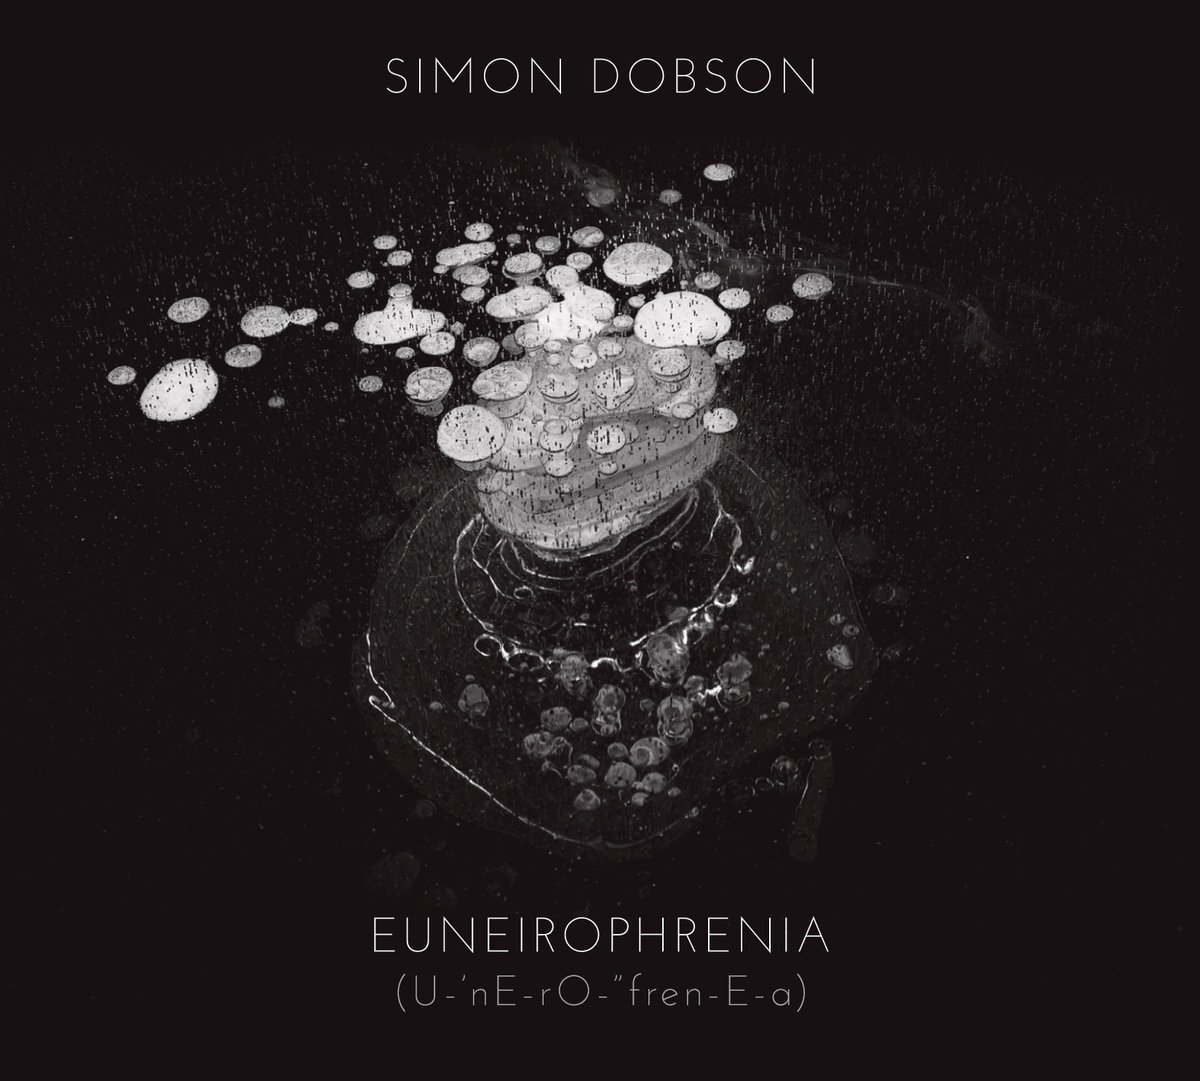 Simon Dobson - Euneirophrenia